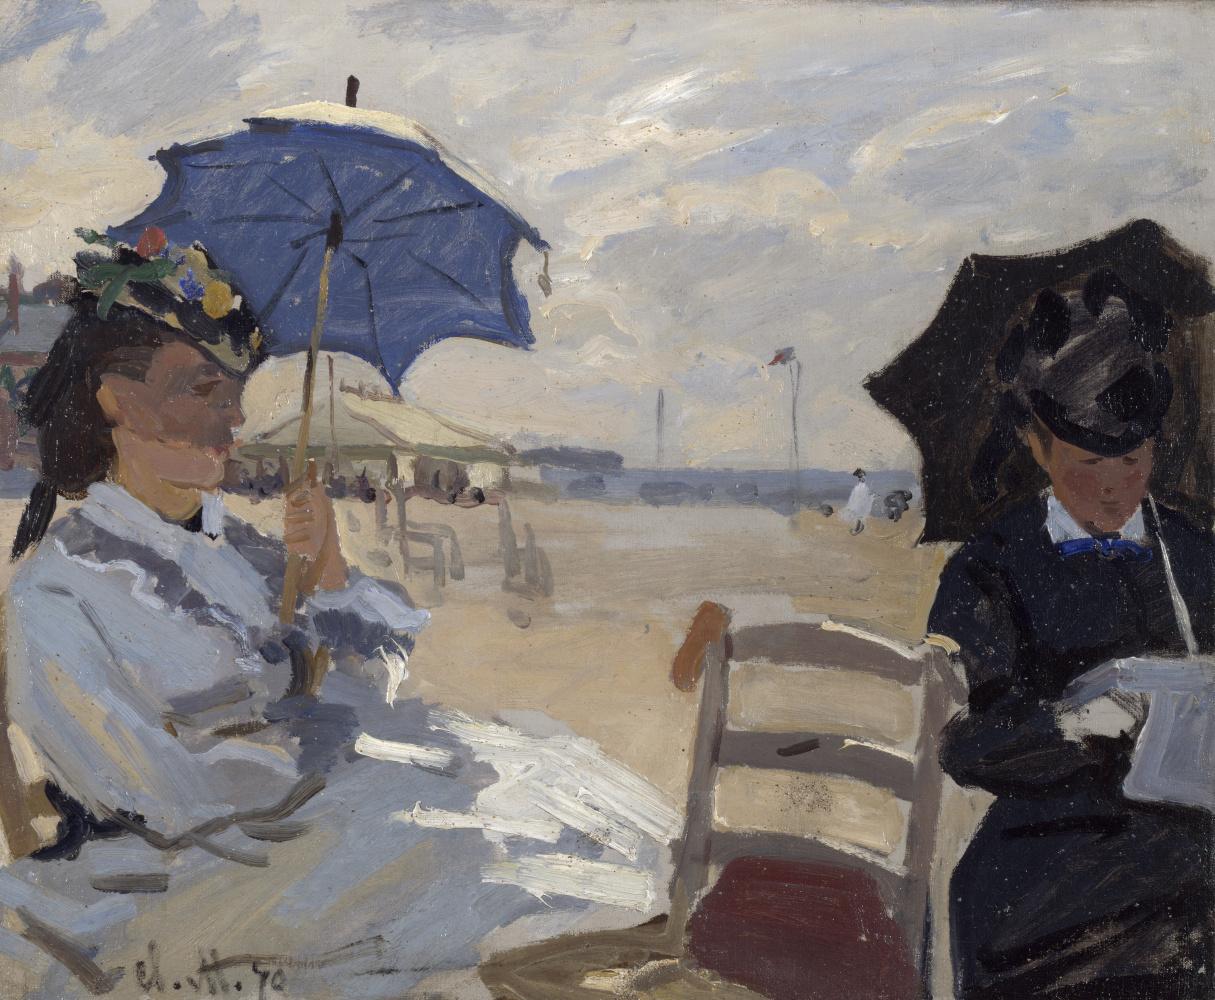 Claude Monet. The beach at Trouville